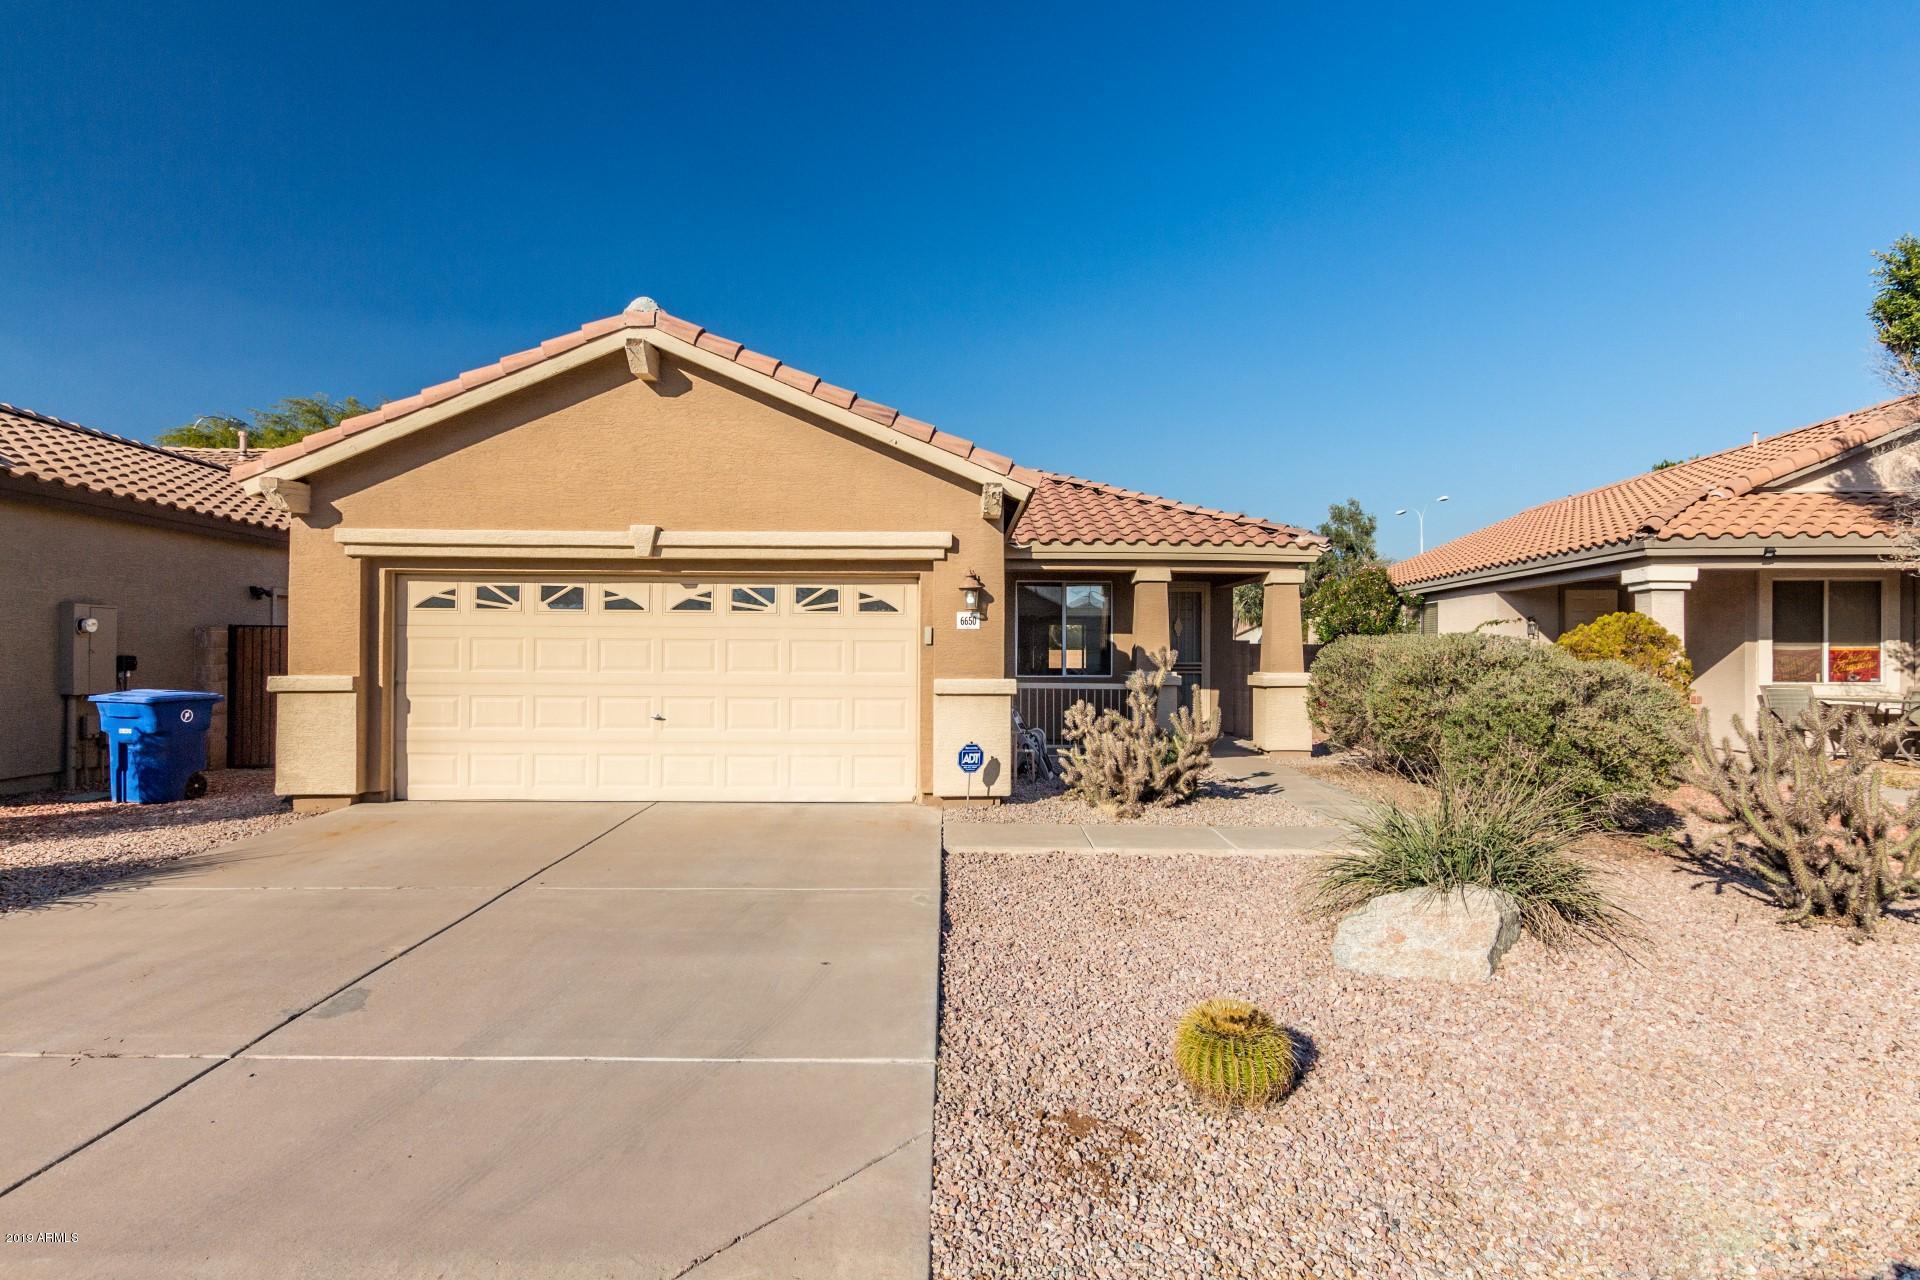 Photo of 6650 W MEGAN Street, Chandler, AZ 85226